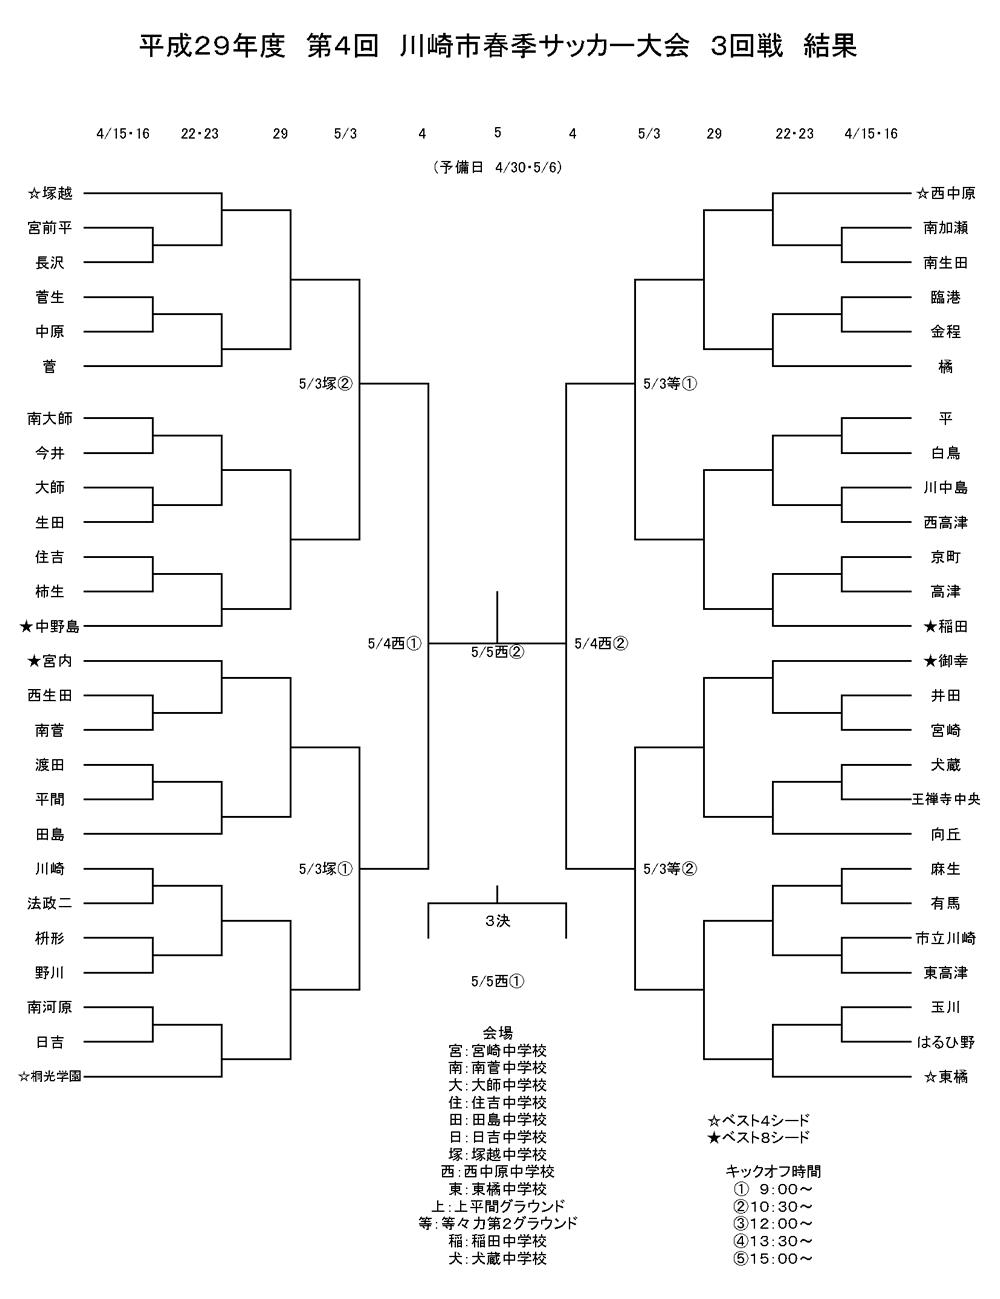 H29第4回春季大会トーナメント